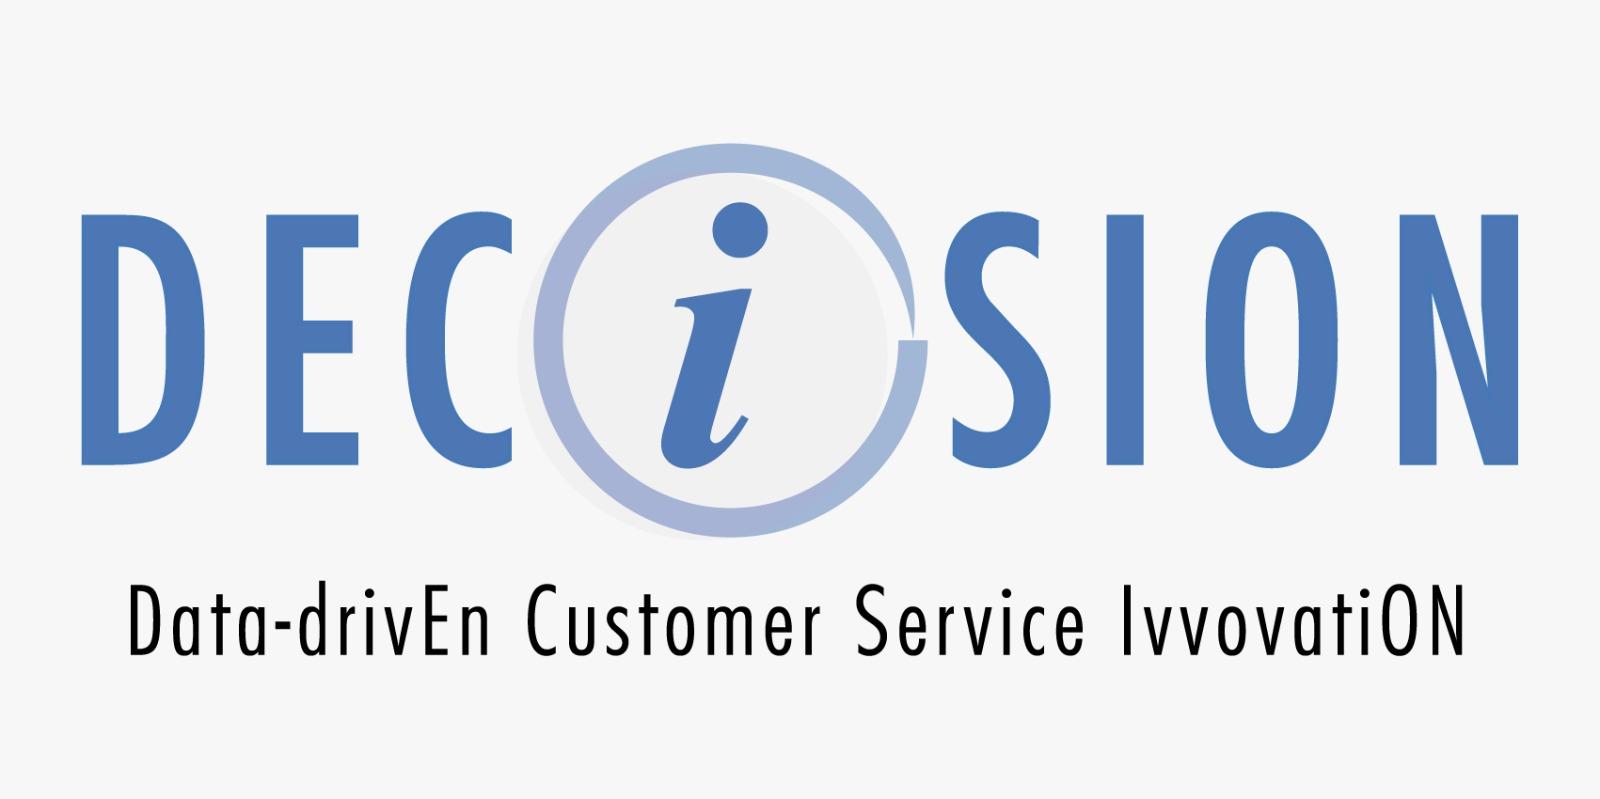 DECISION-Data-drivEn Customer Service InnovatiON